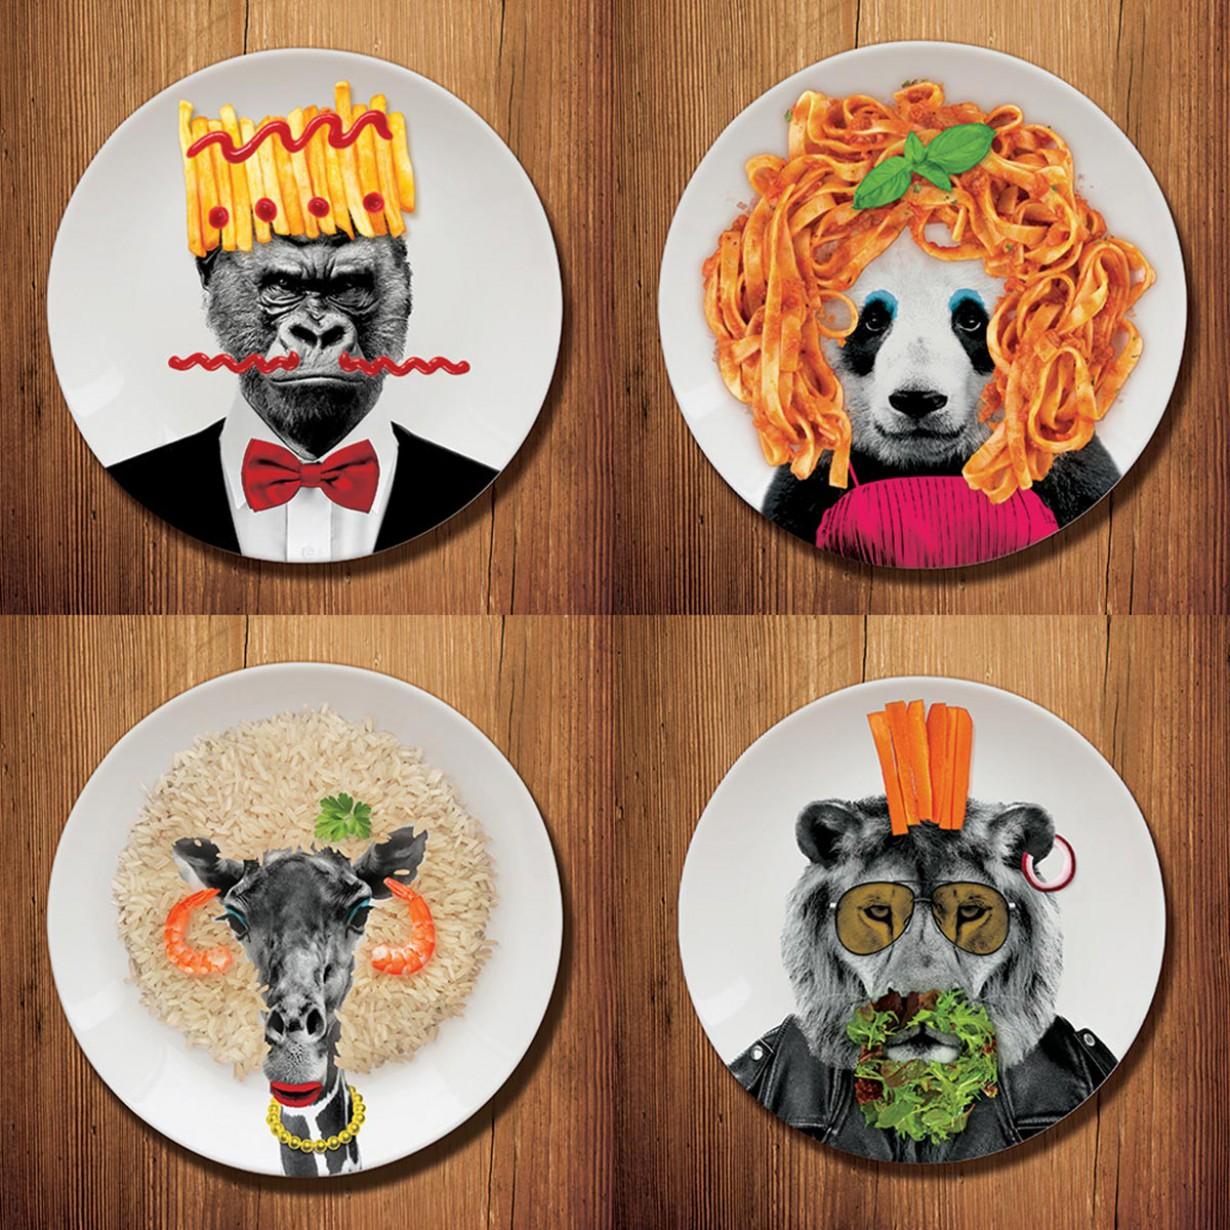 wild-dining-teller-701